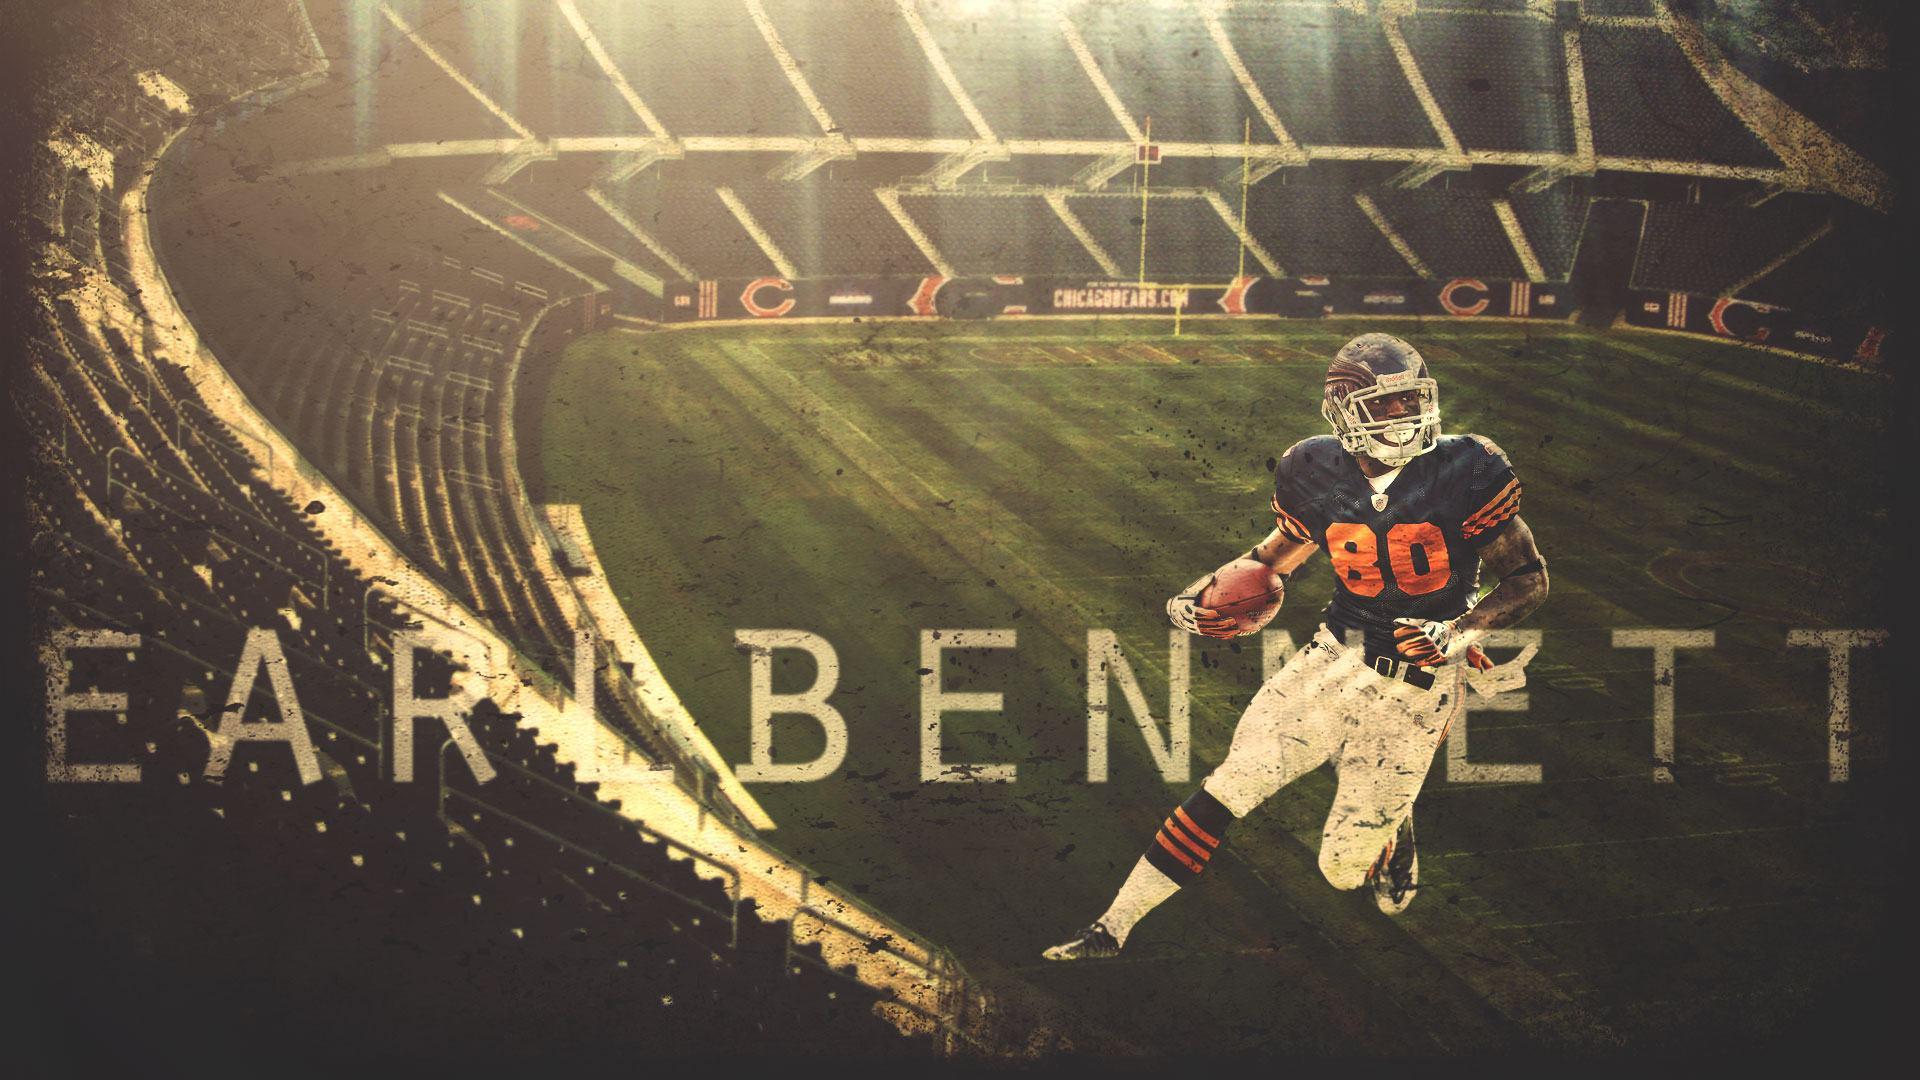 2737 Earl Bennett Chicago Bears 1920x1080 wallpaper 1920x1080jpg 1920x1080